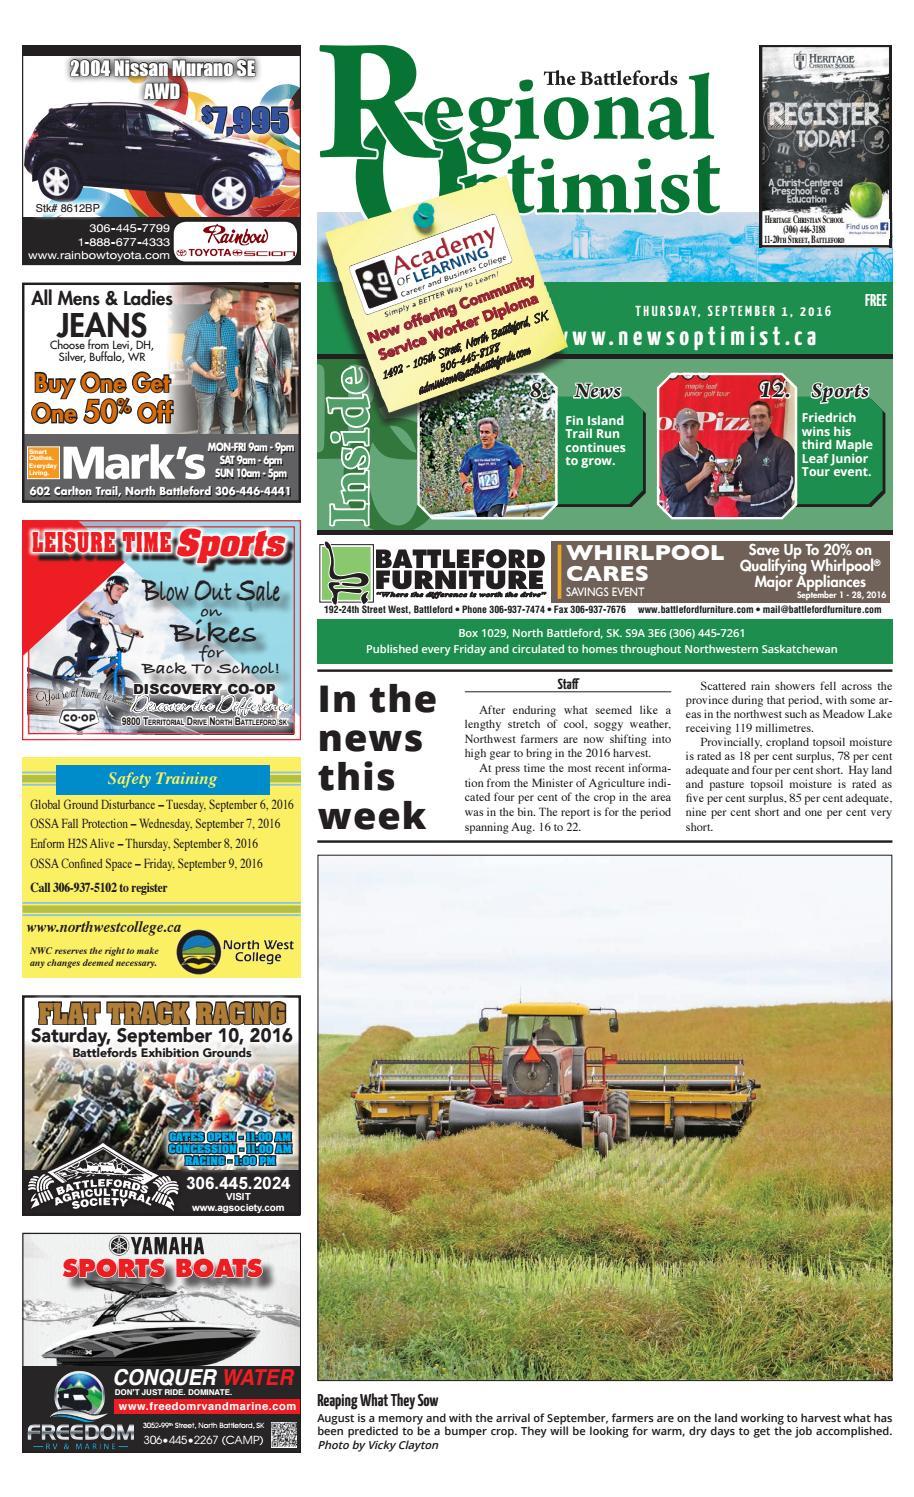 1408bdc4 Regional Optimist September 1 by Battlefords News Optimist - issuu